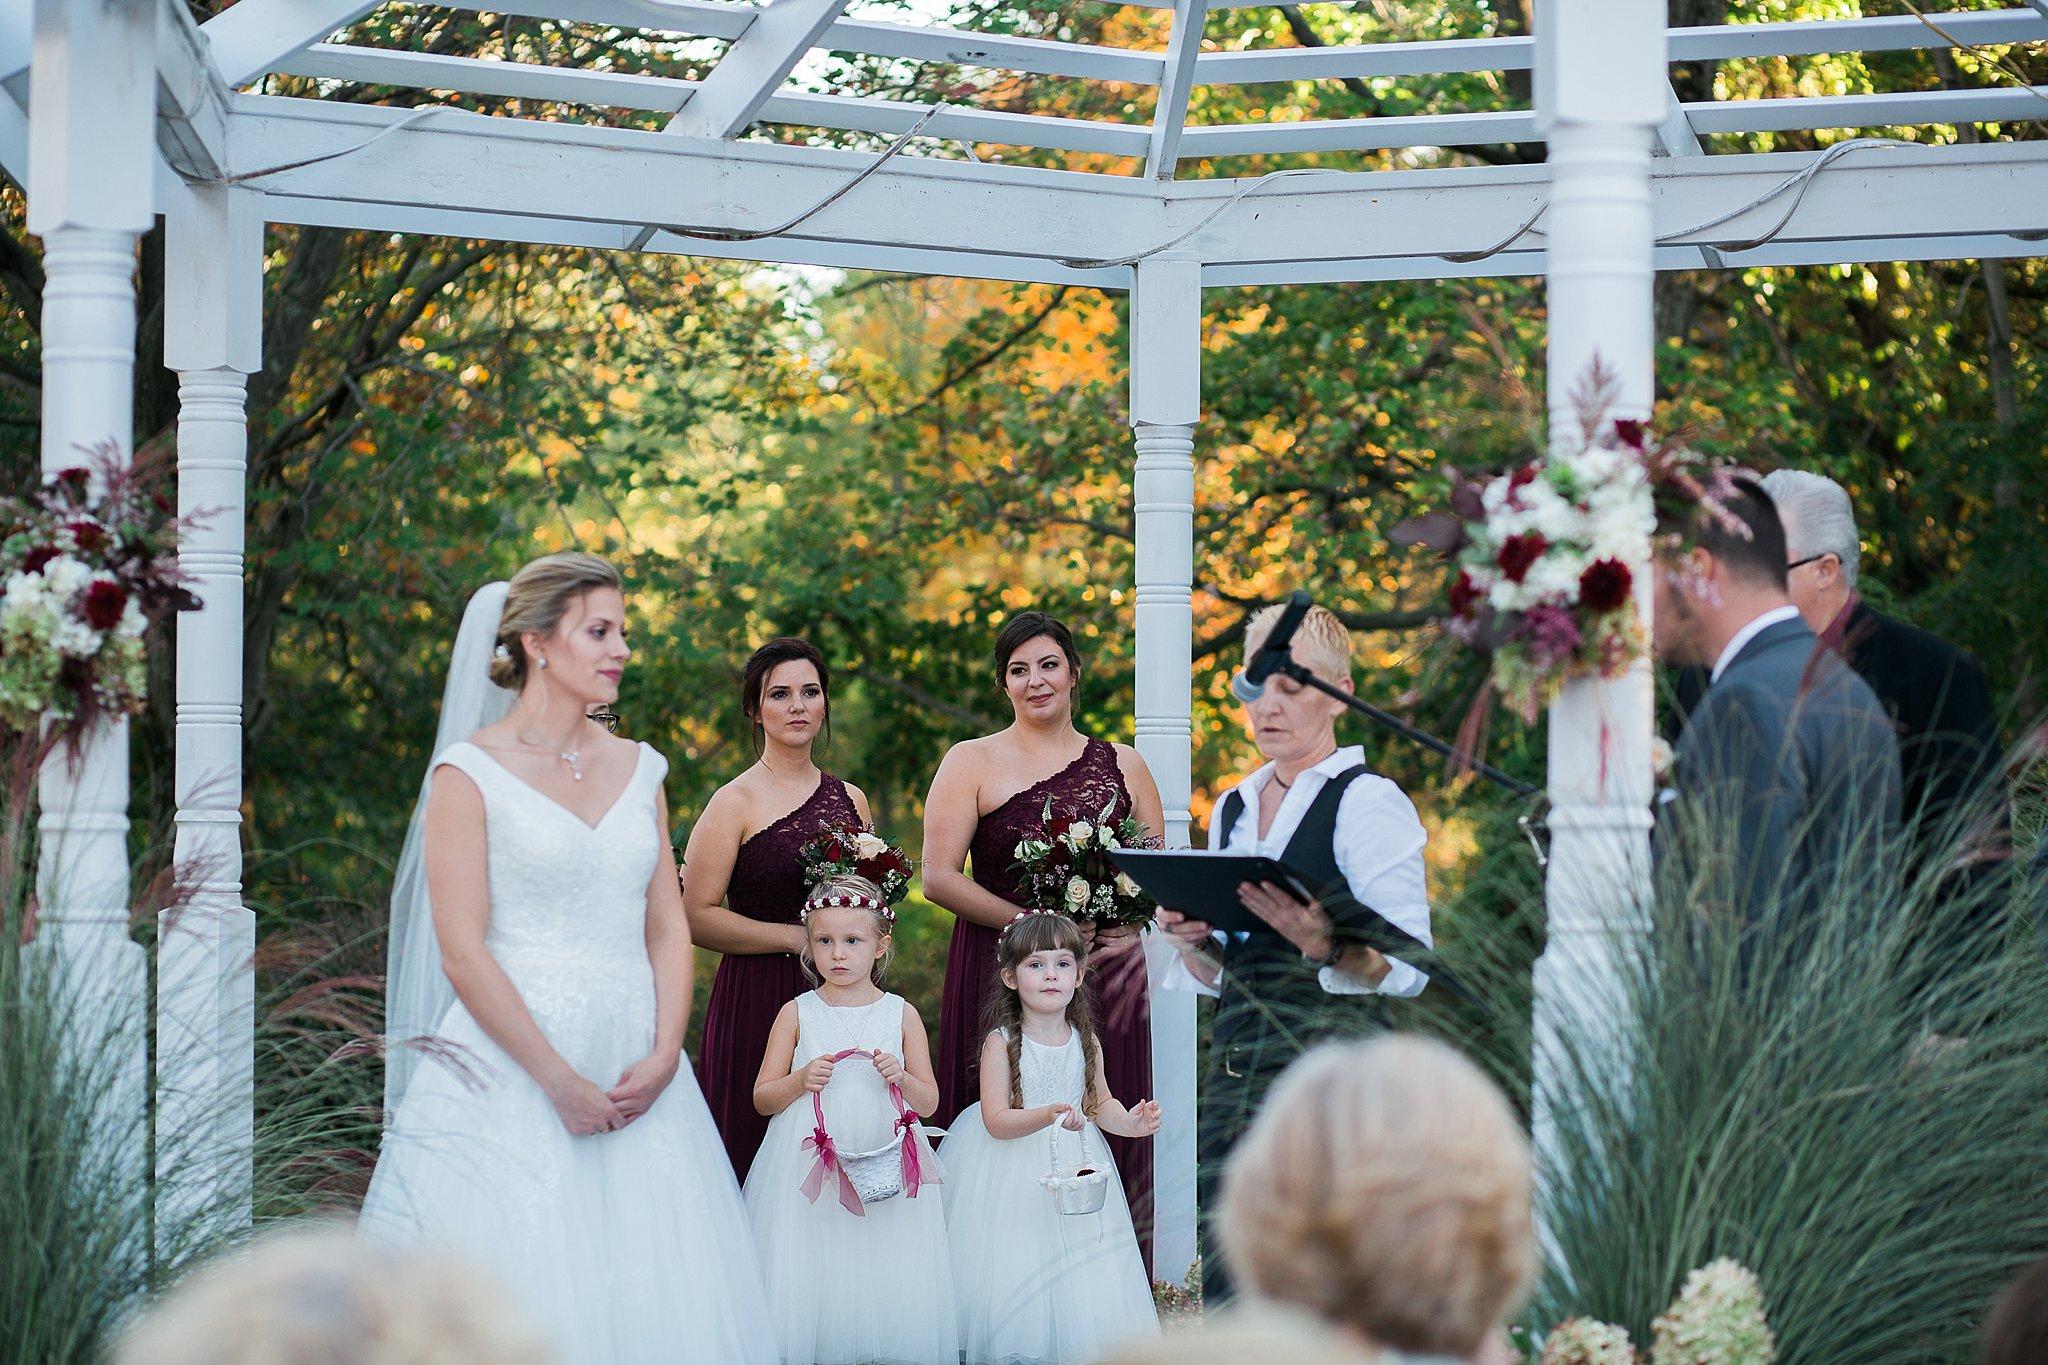 New Windsor New York Hudson Valley New York Wedding Photographer 41.jpg